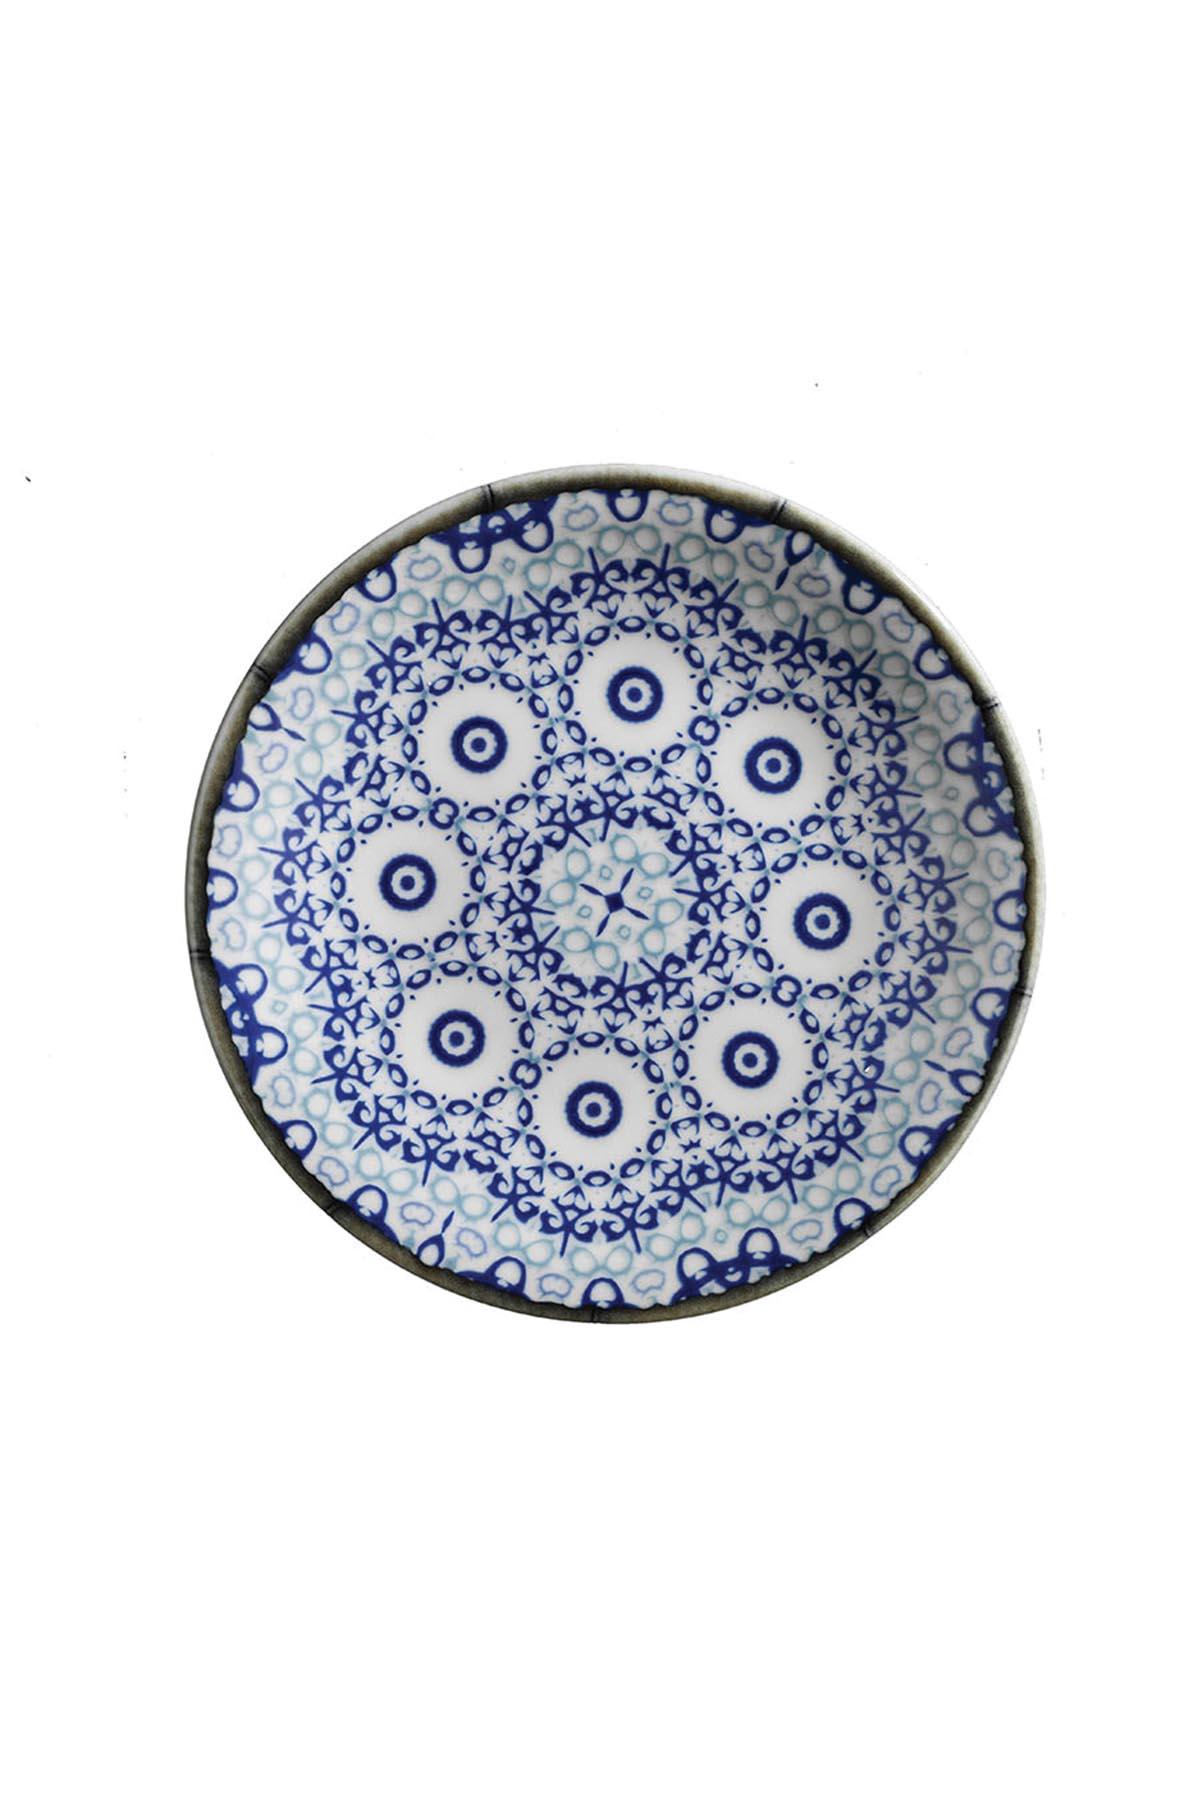 Kütahya Porselen Teos Servis Tabağı 91312 Desen